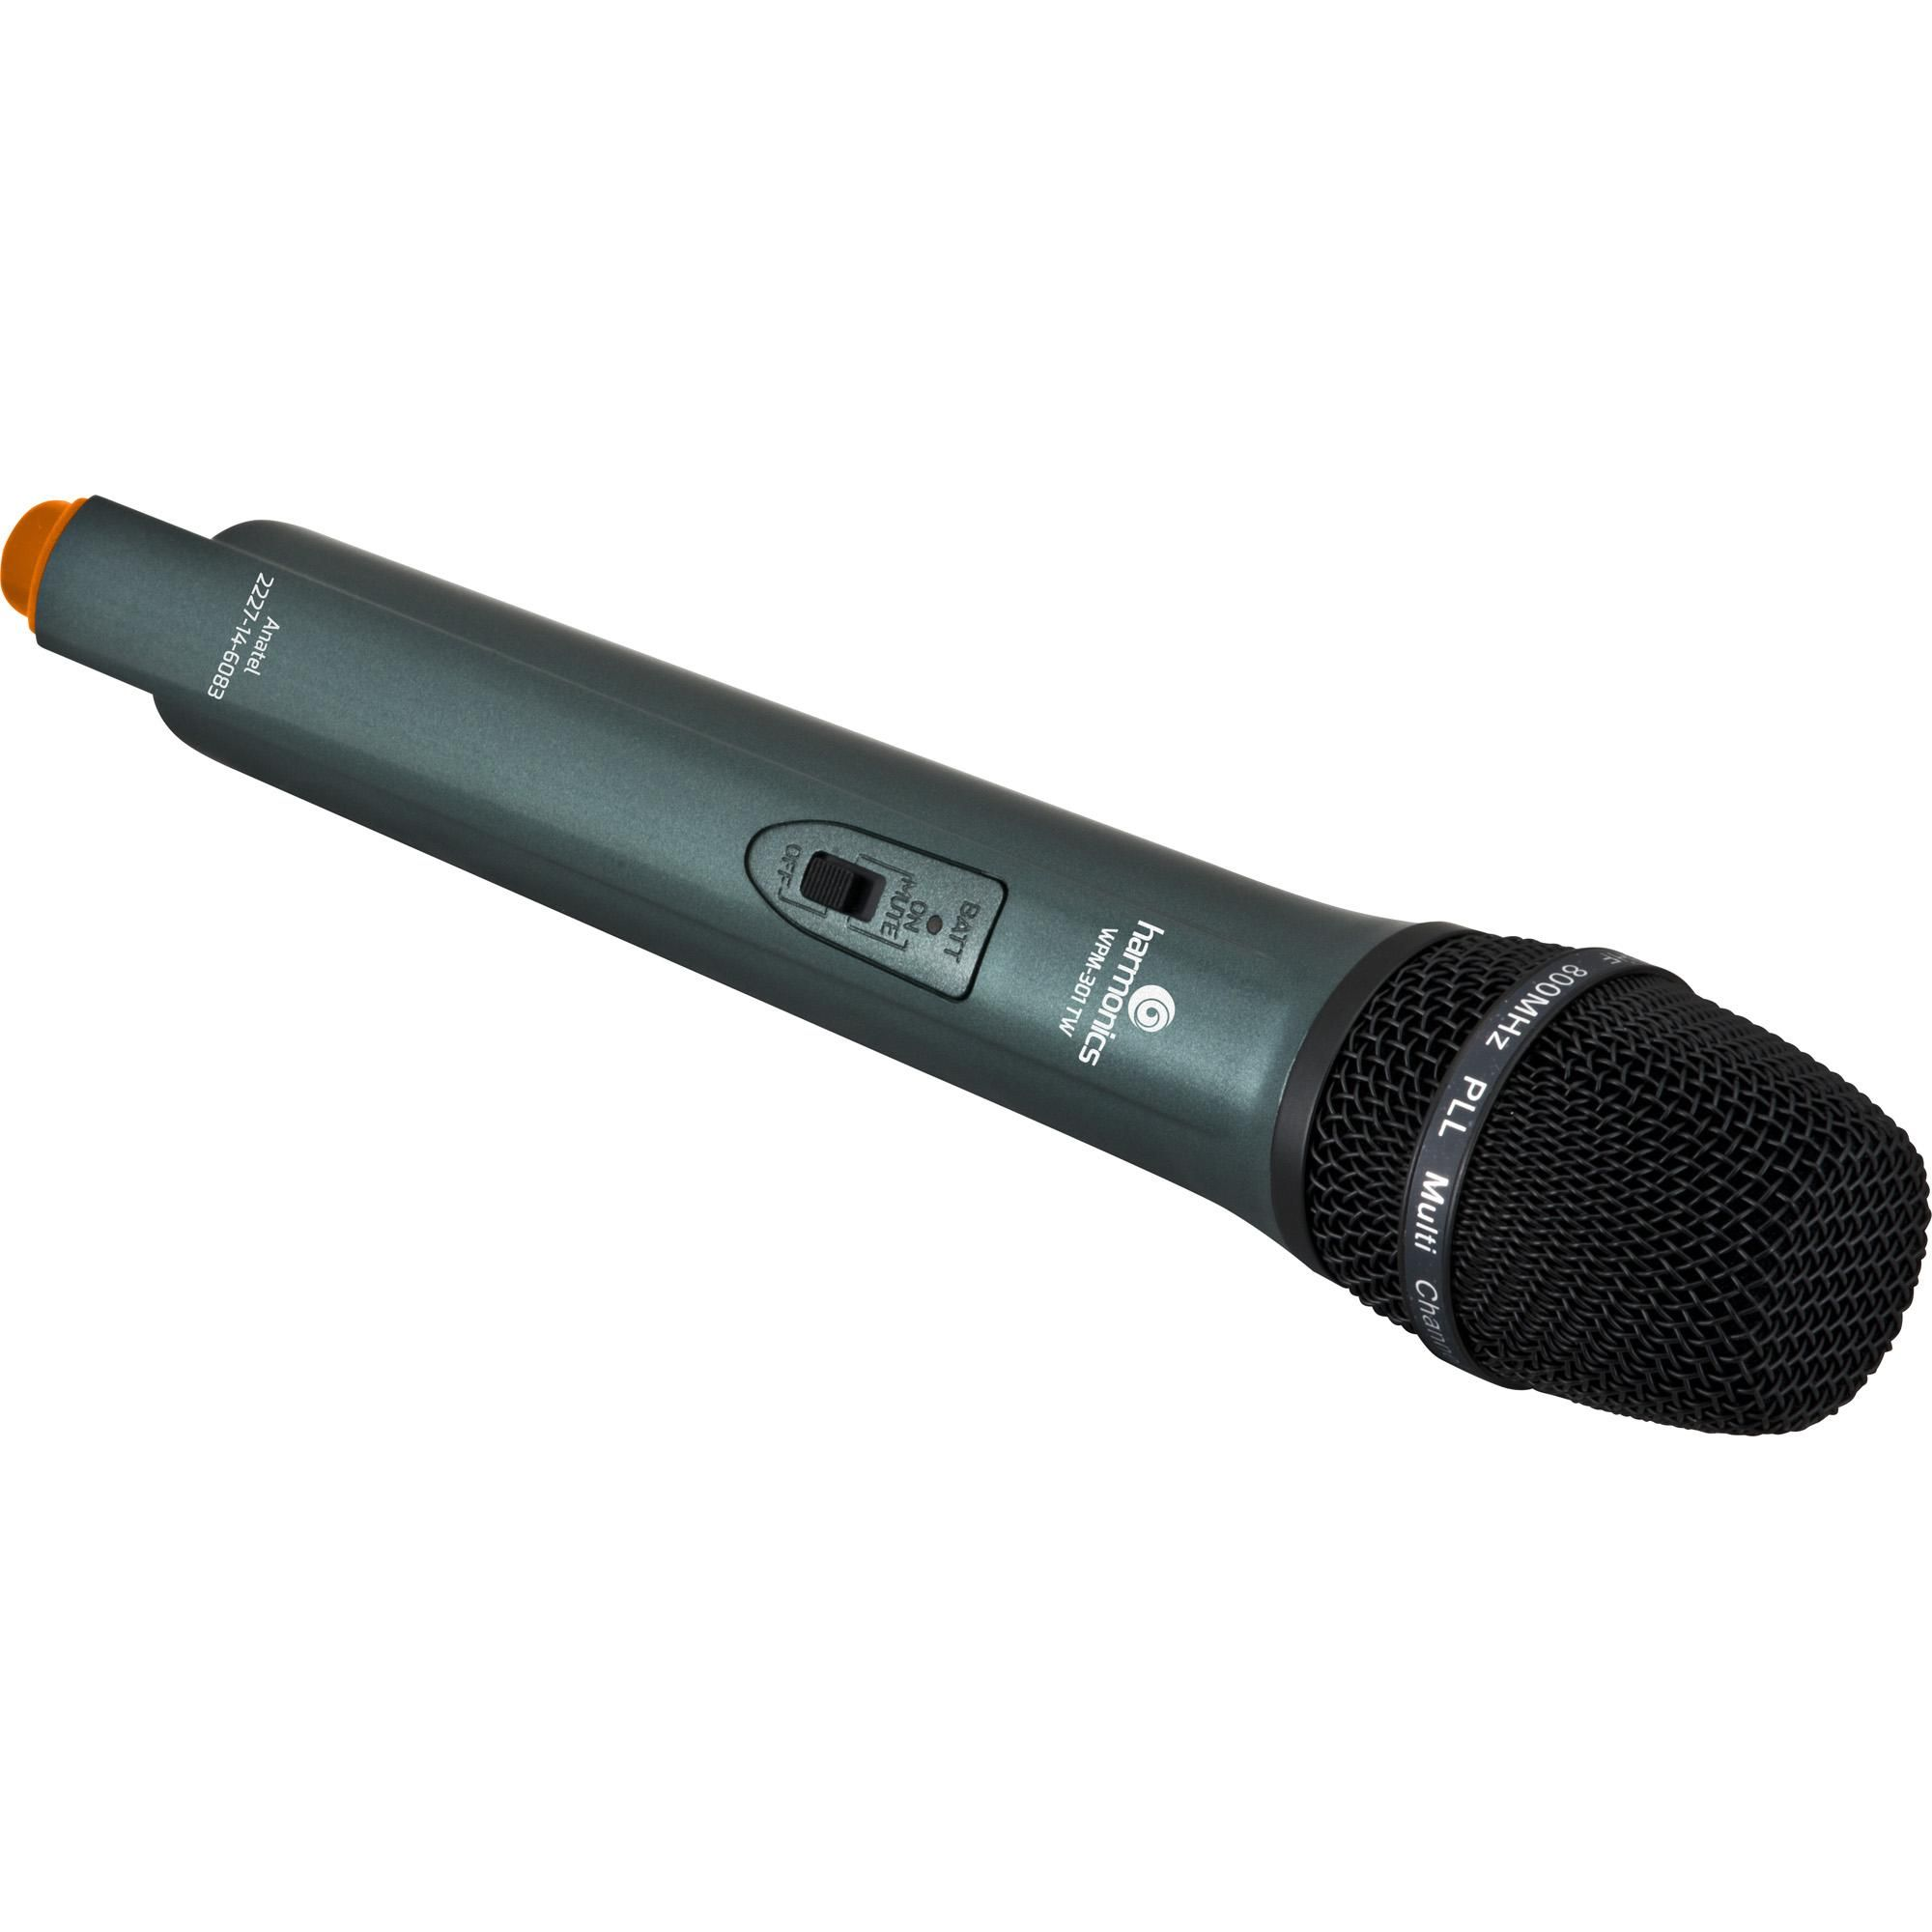 MICROFONE S/ FIO UHF DUPLO WPM301TW HARMONICS